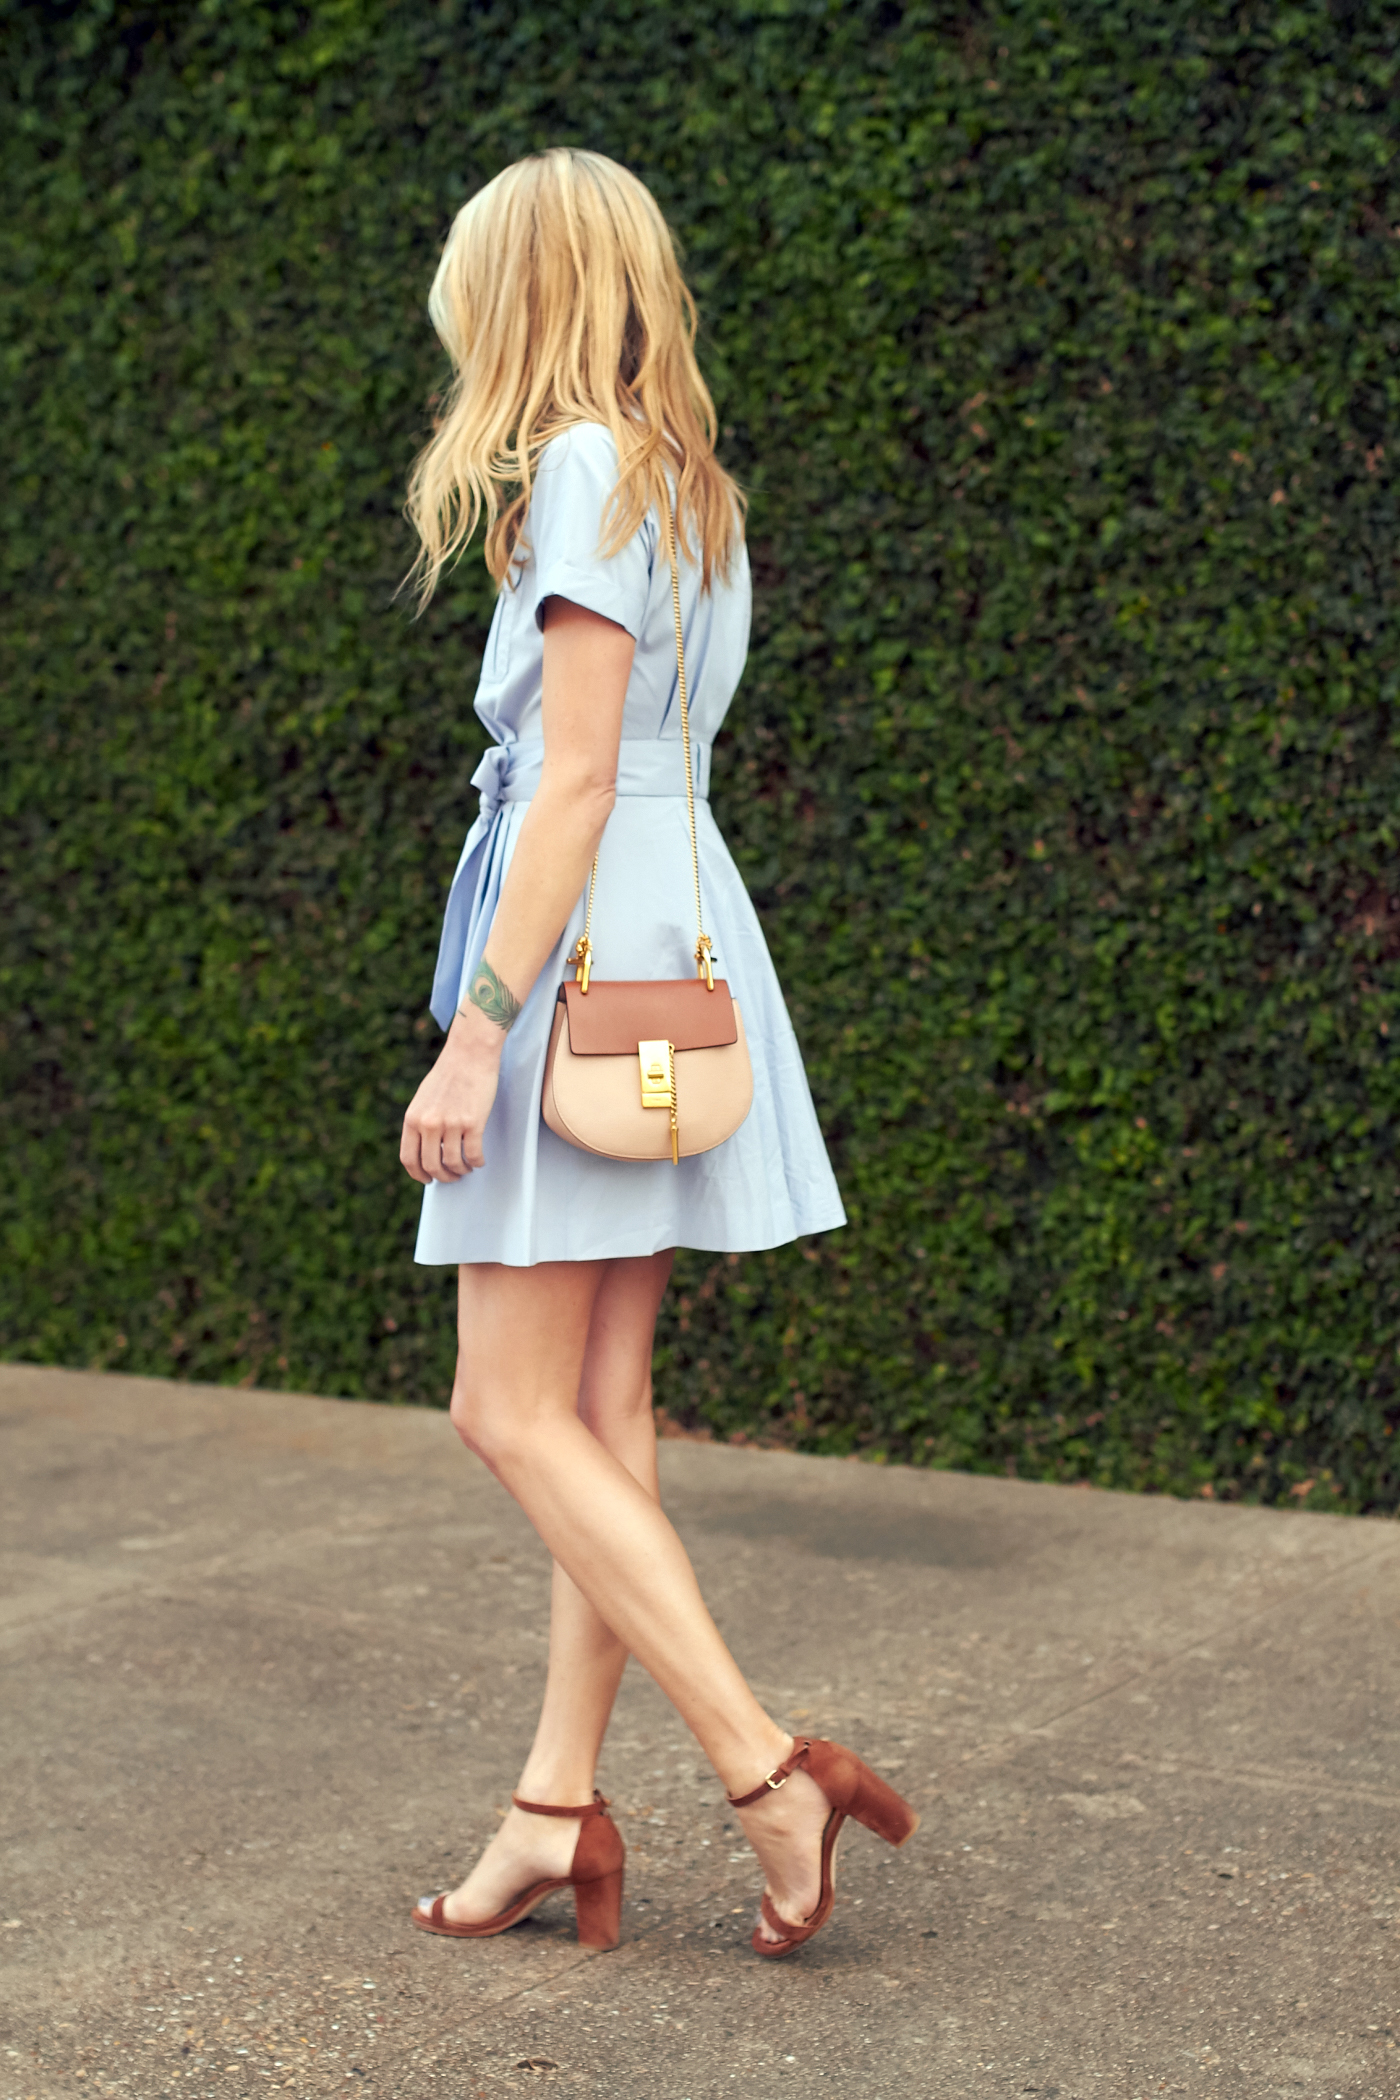 fashion-jackson-chloe-drew-handbag-nordstrom-blue-shirtdress-stuart-weitzman-nearly-nude-sandals